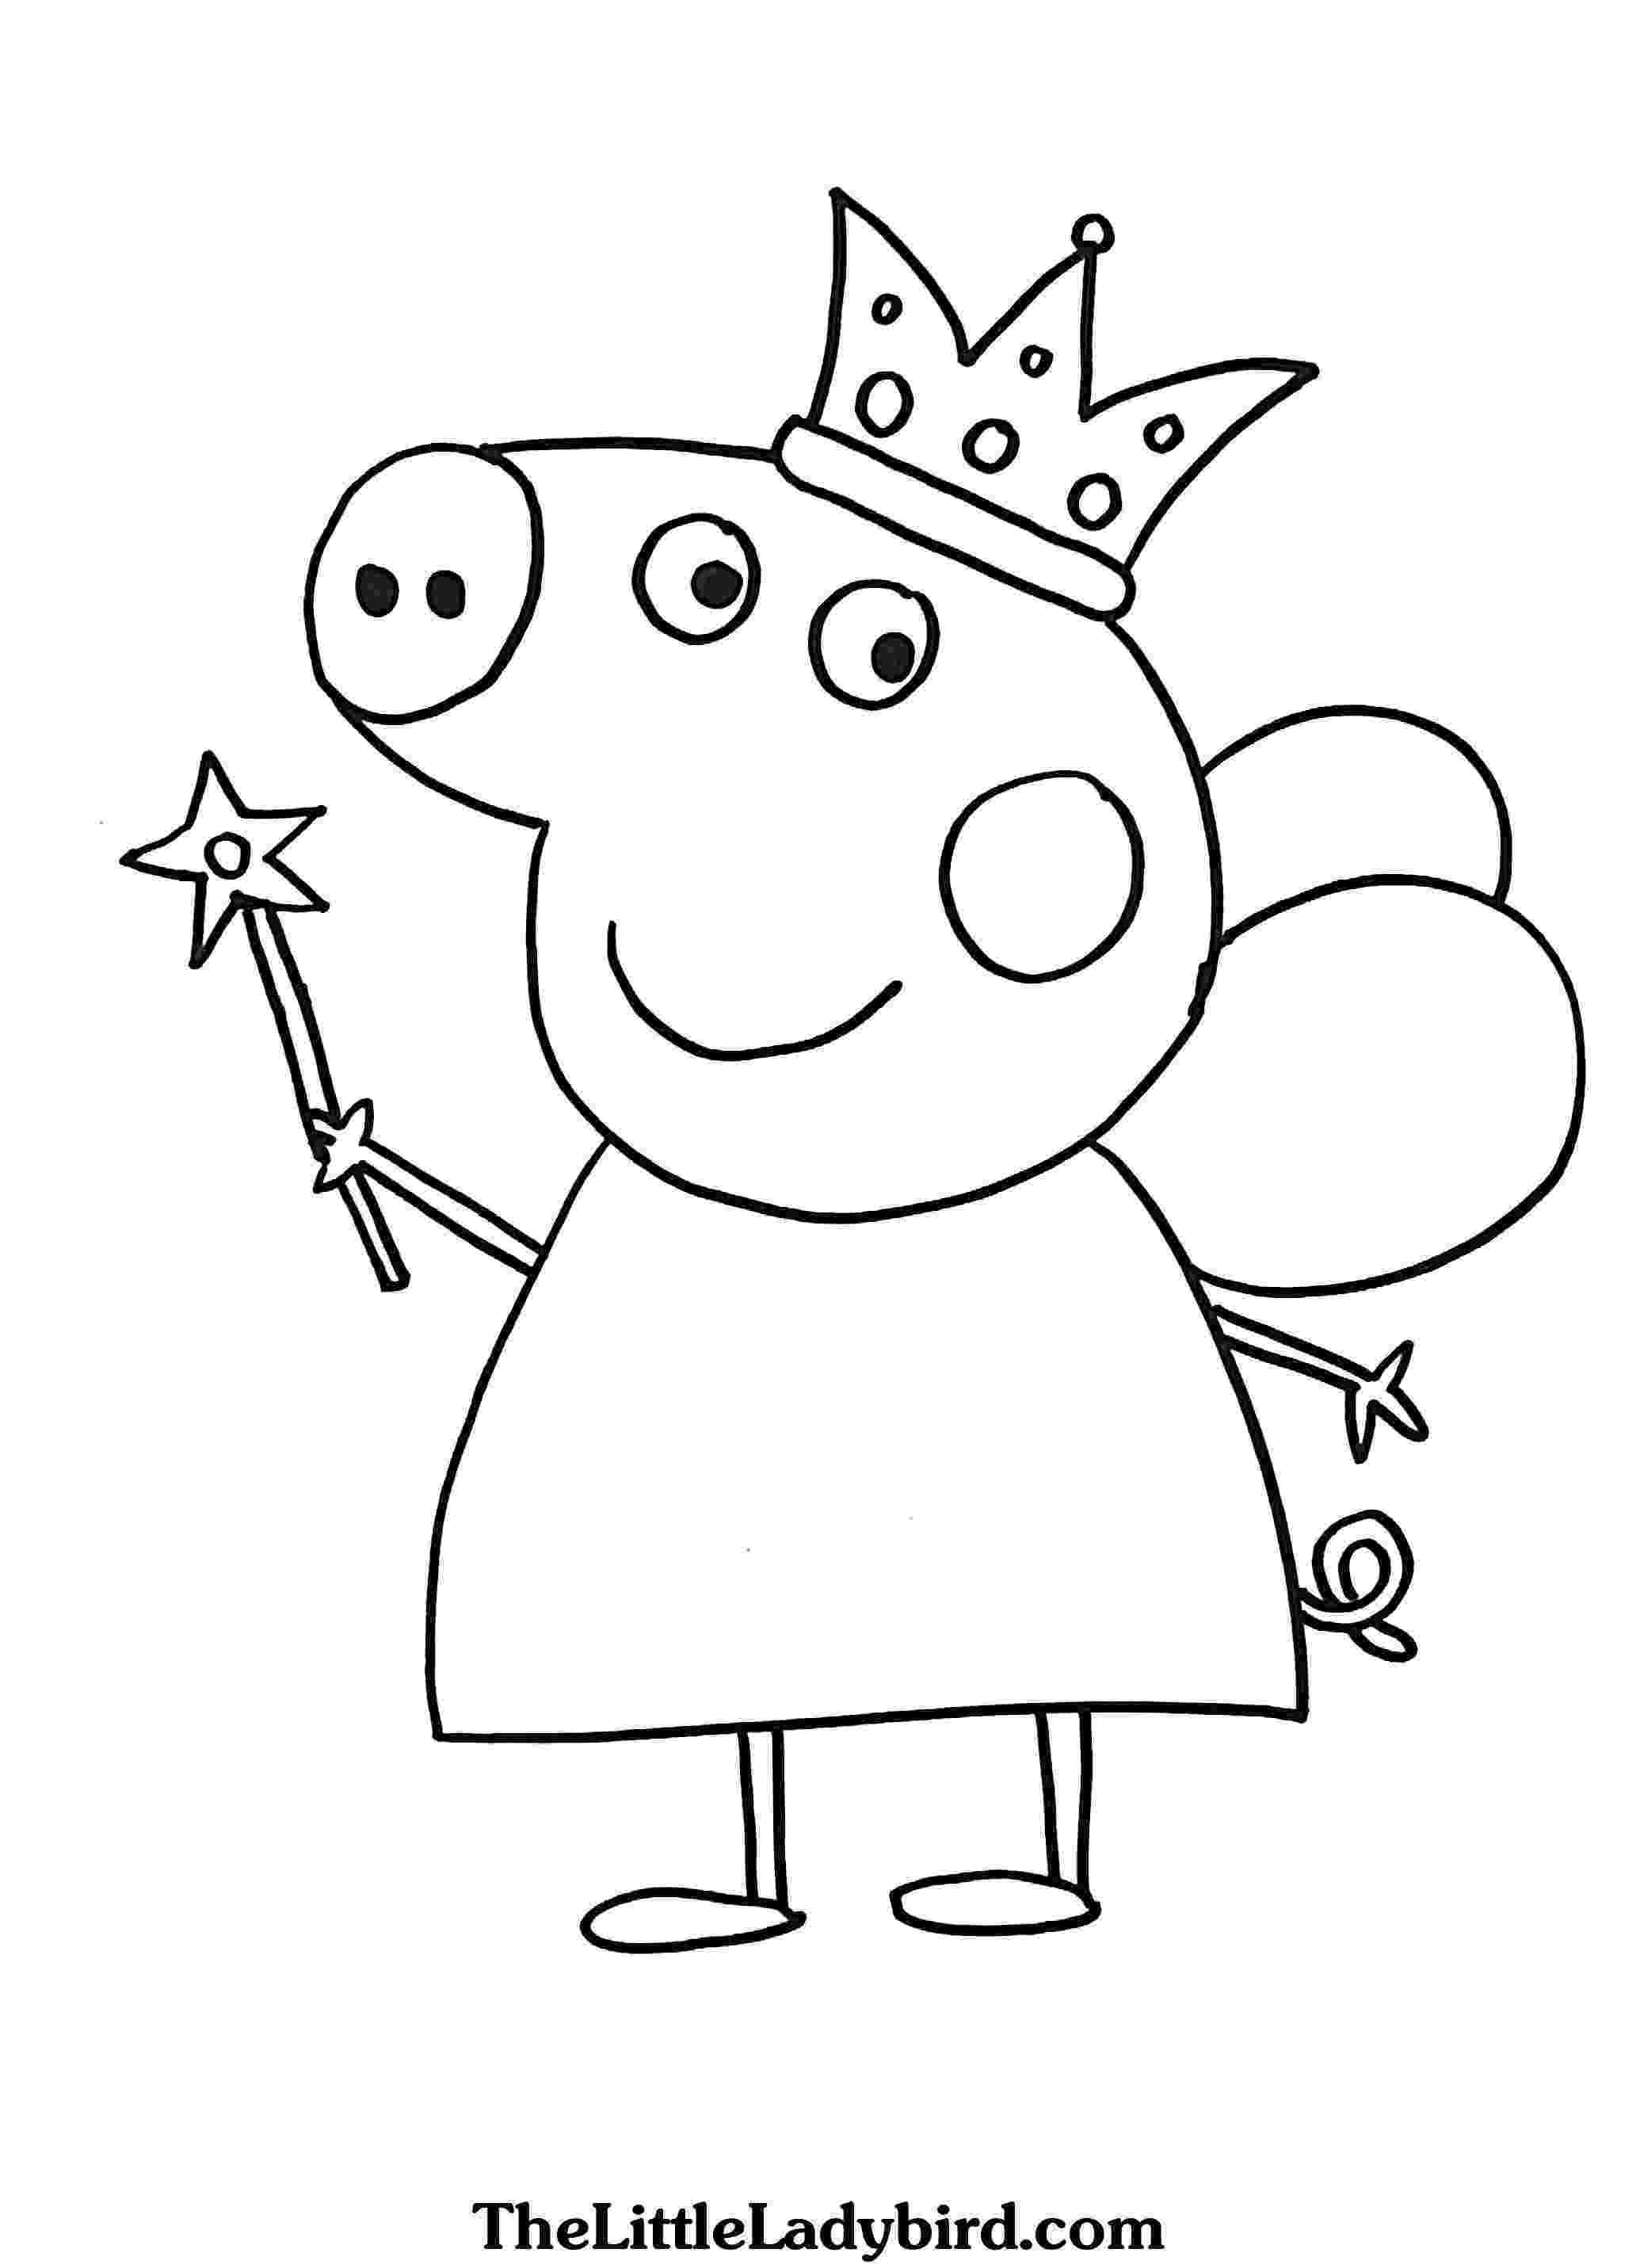 peppa pig coloring page peppa pig christmas sleigh colouring peppa pig coloring page peppa pig coloring